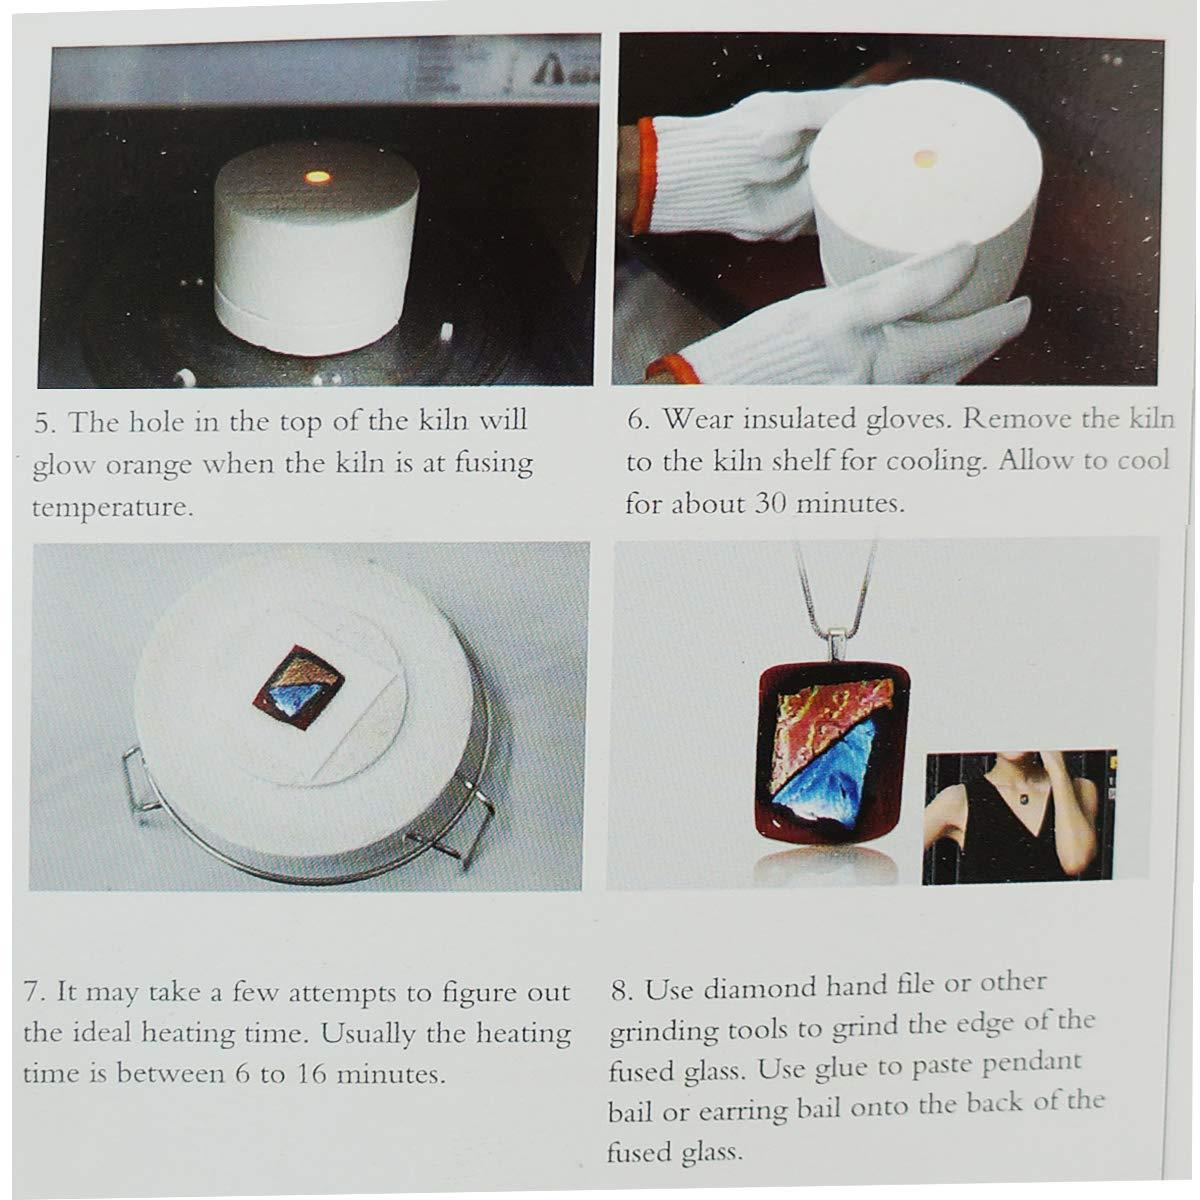 Microwave Kiln and DIY Fusing Glass Jewelry Set,Extra Large Microwave Kiln Kit For Fusing Glass Kiln 10 PCS Set,ROY ROJAS Professional Microwave Kiln Kit Set - for DIY Jewelry Glass Fusing Kiln tools by ROY ROJAS (Image #5)